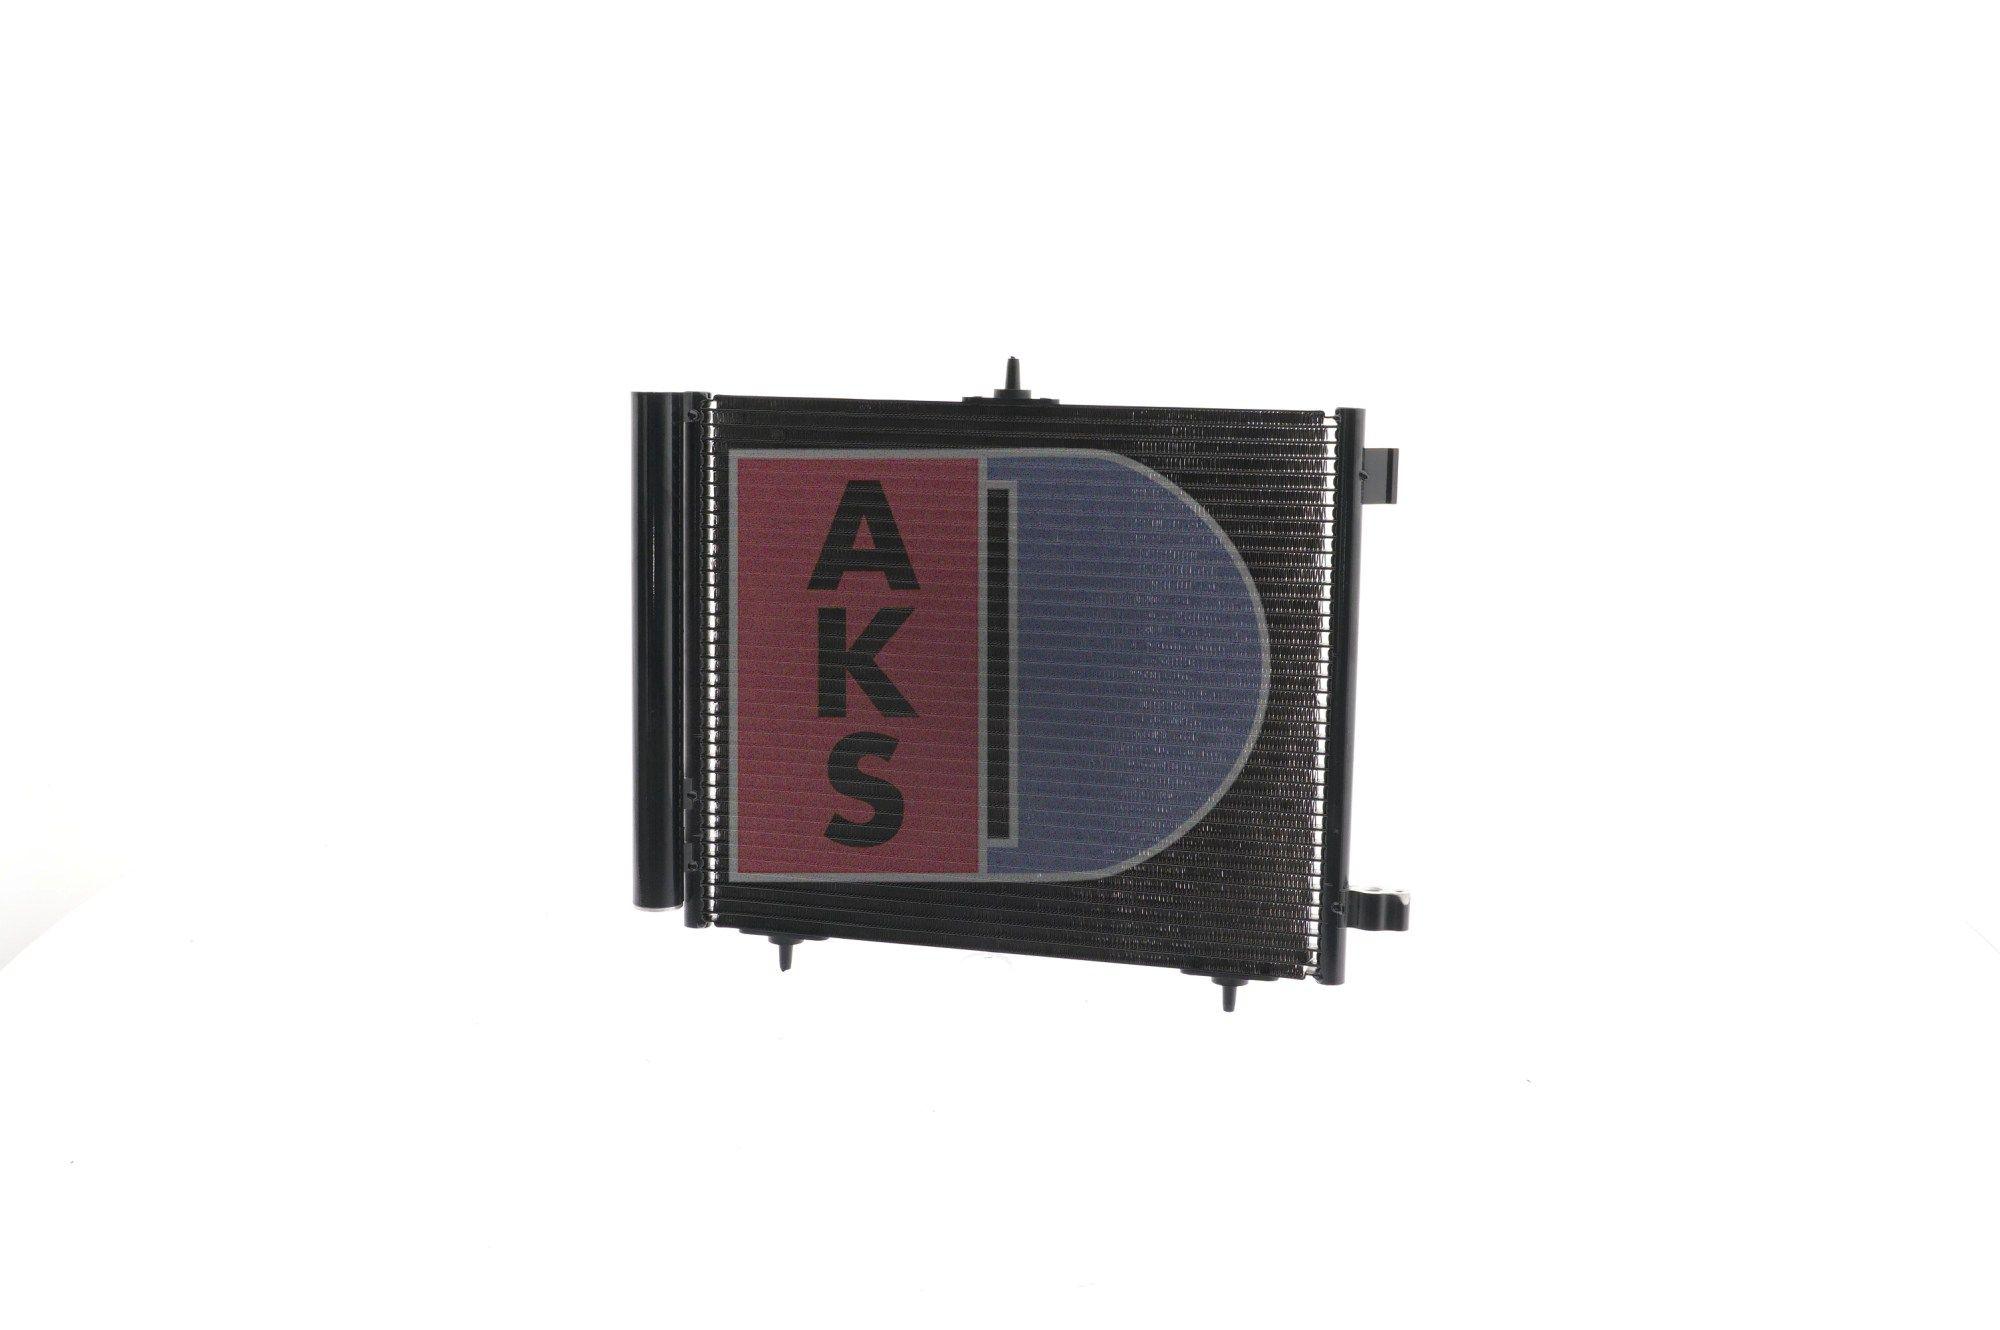 OE Original Klimakondensator 062004N AKS DASIS